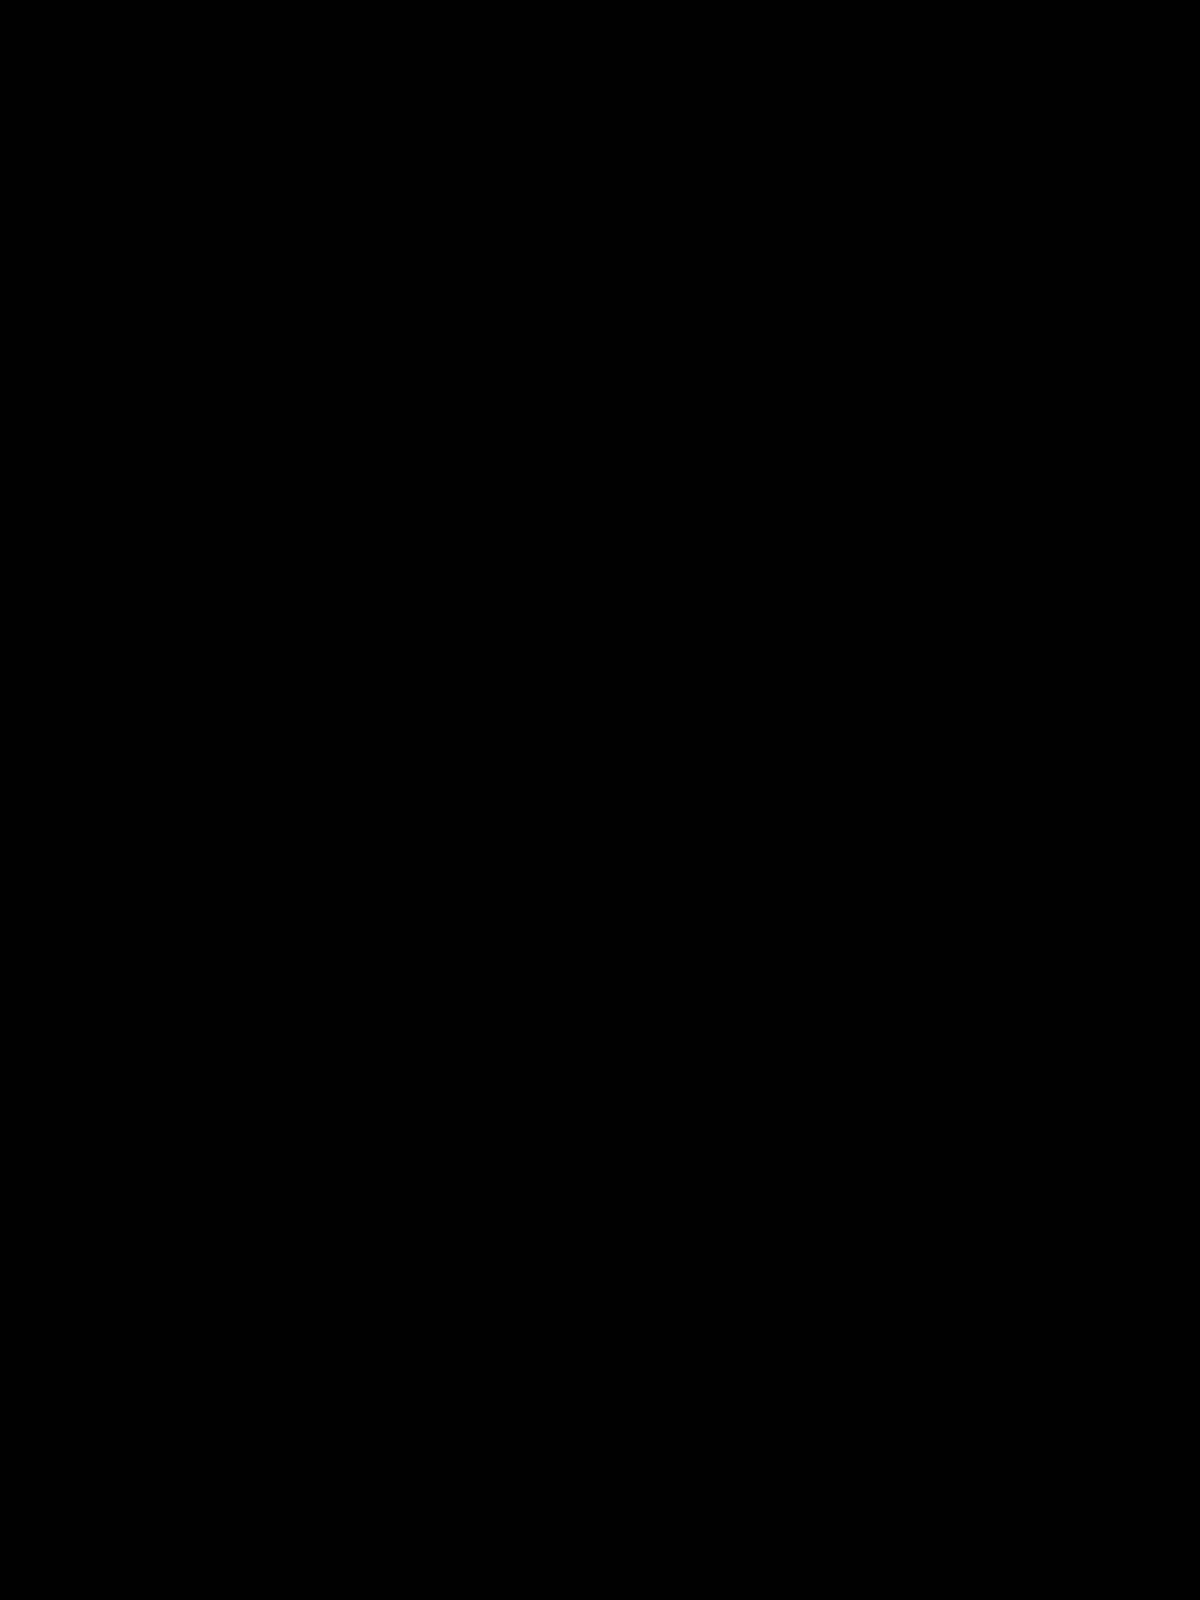 Masca de protectie 3 straturi